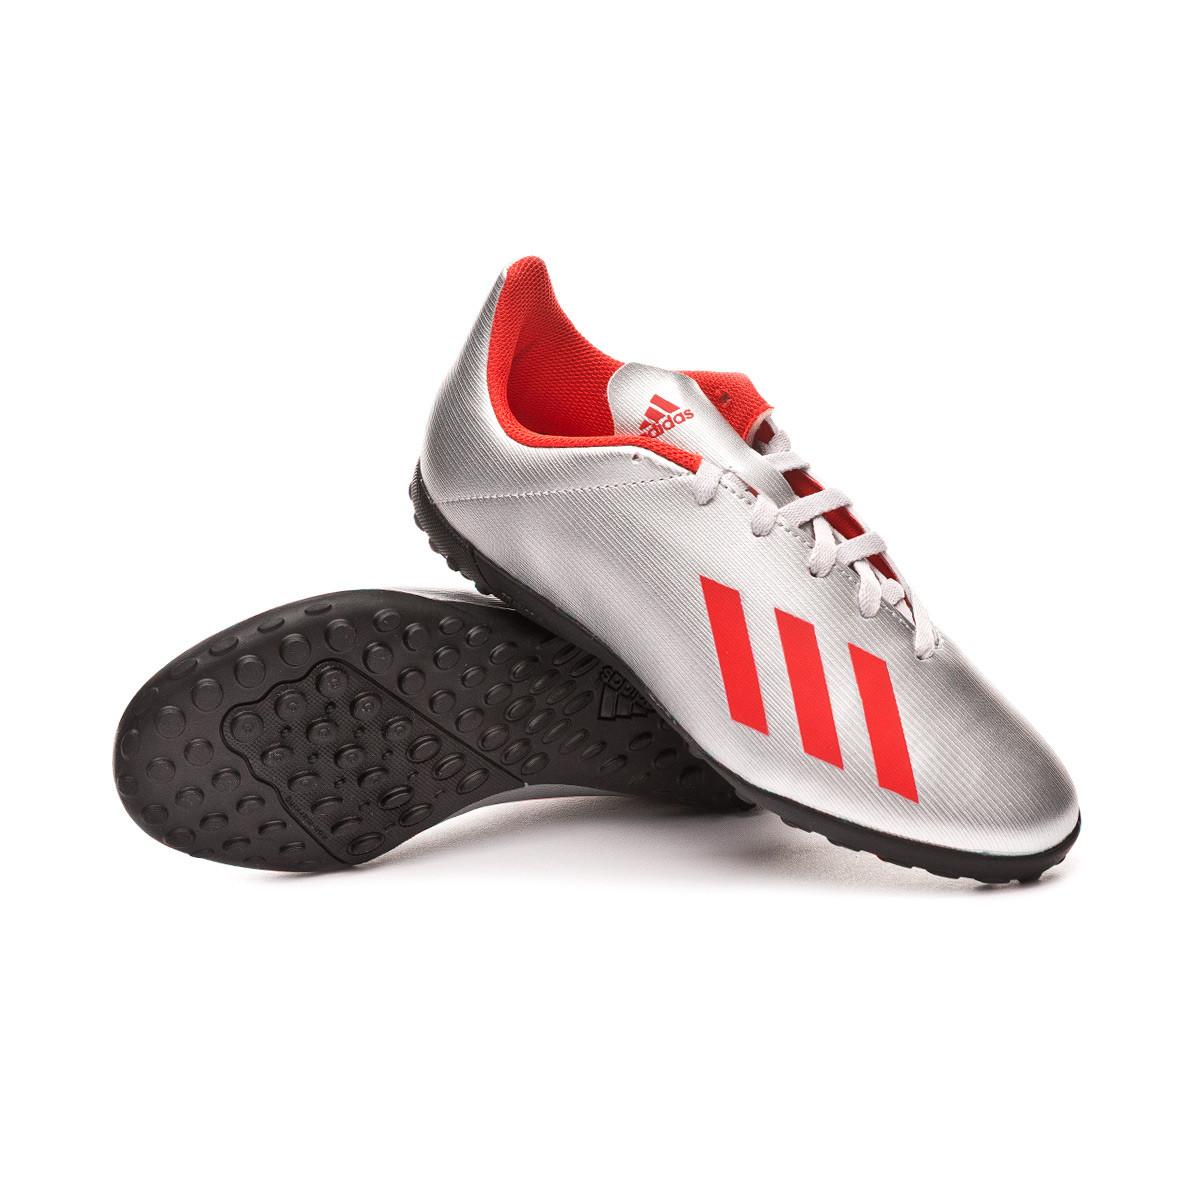 Football 4 Silver Enfant X Turf Metallic Hi Adidas 19 Chaussure De TiuOkXZP